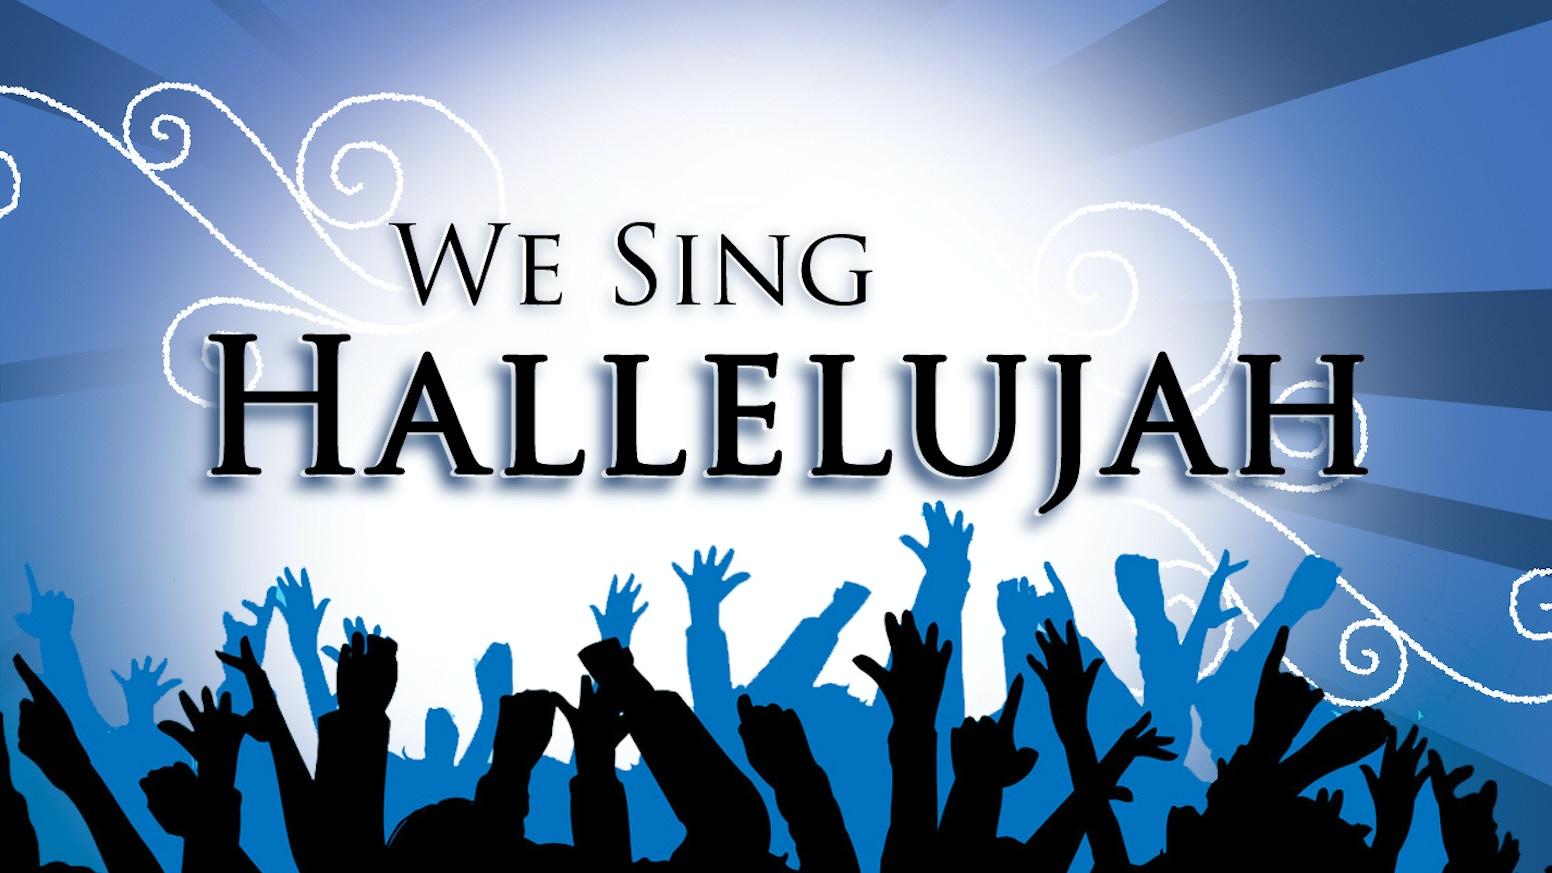 We Sing Hallelujah - Worship Album by Toby L  Baxley